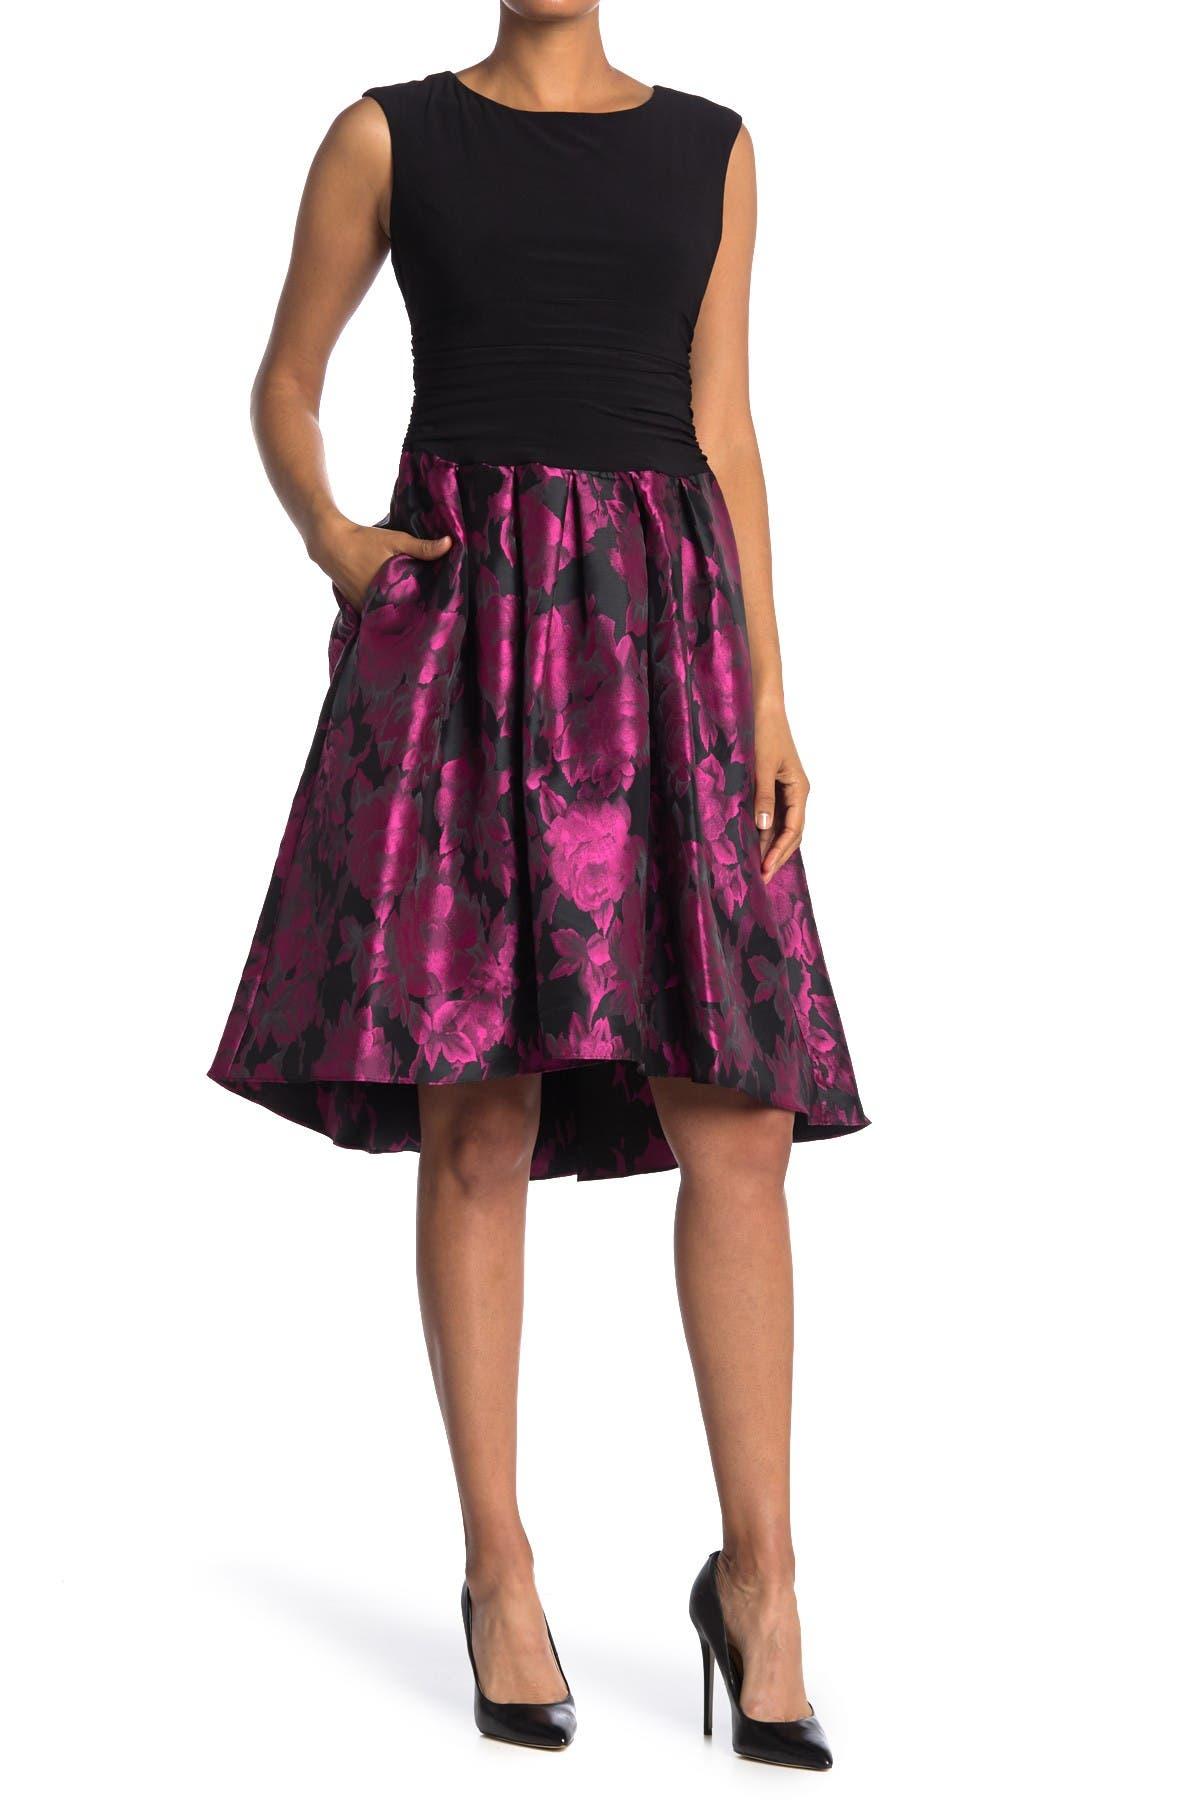 Image of SLNY Floral Jacquard Skirt Dress